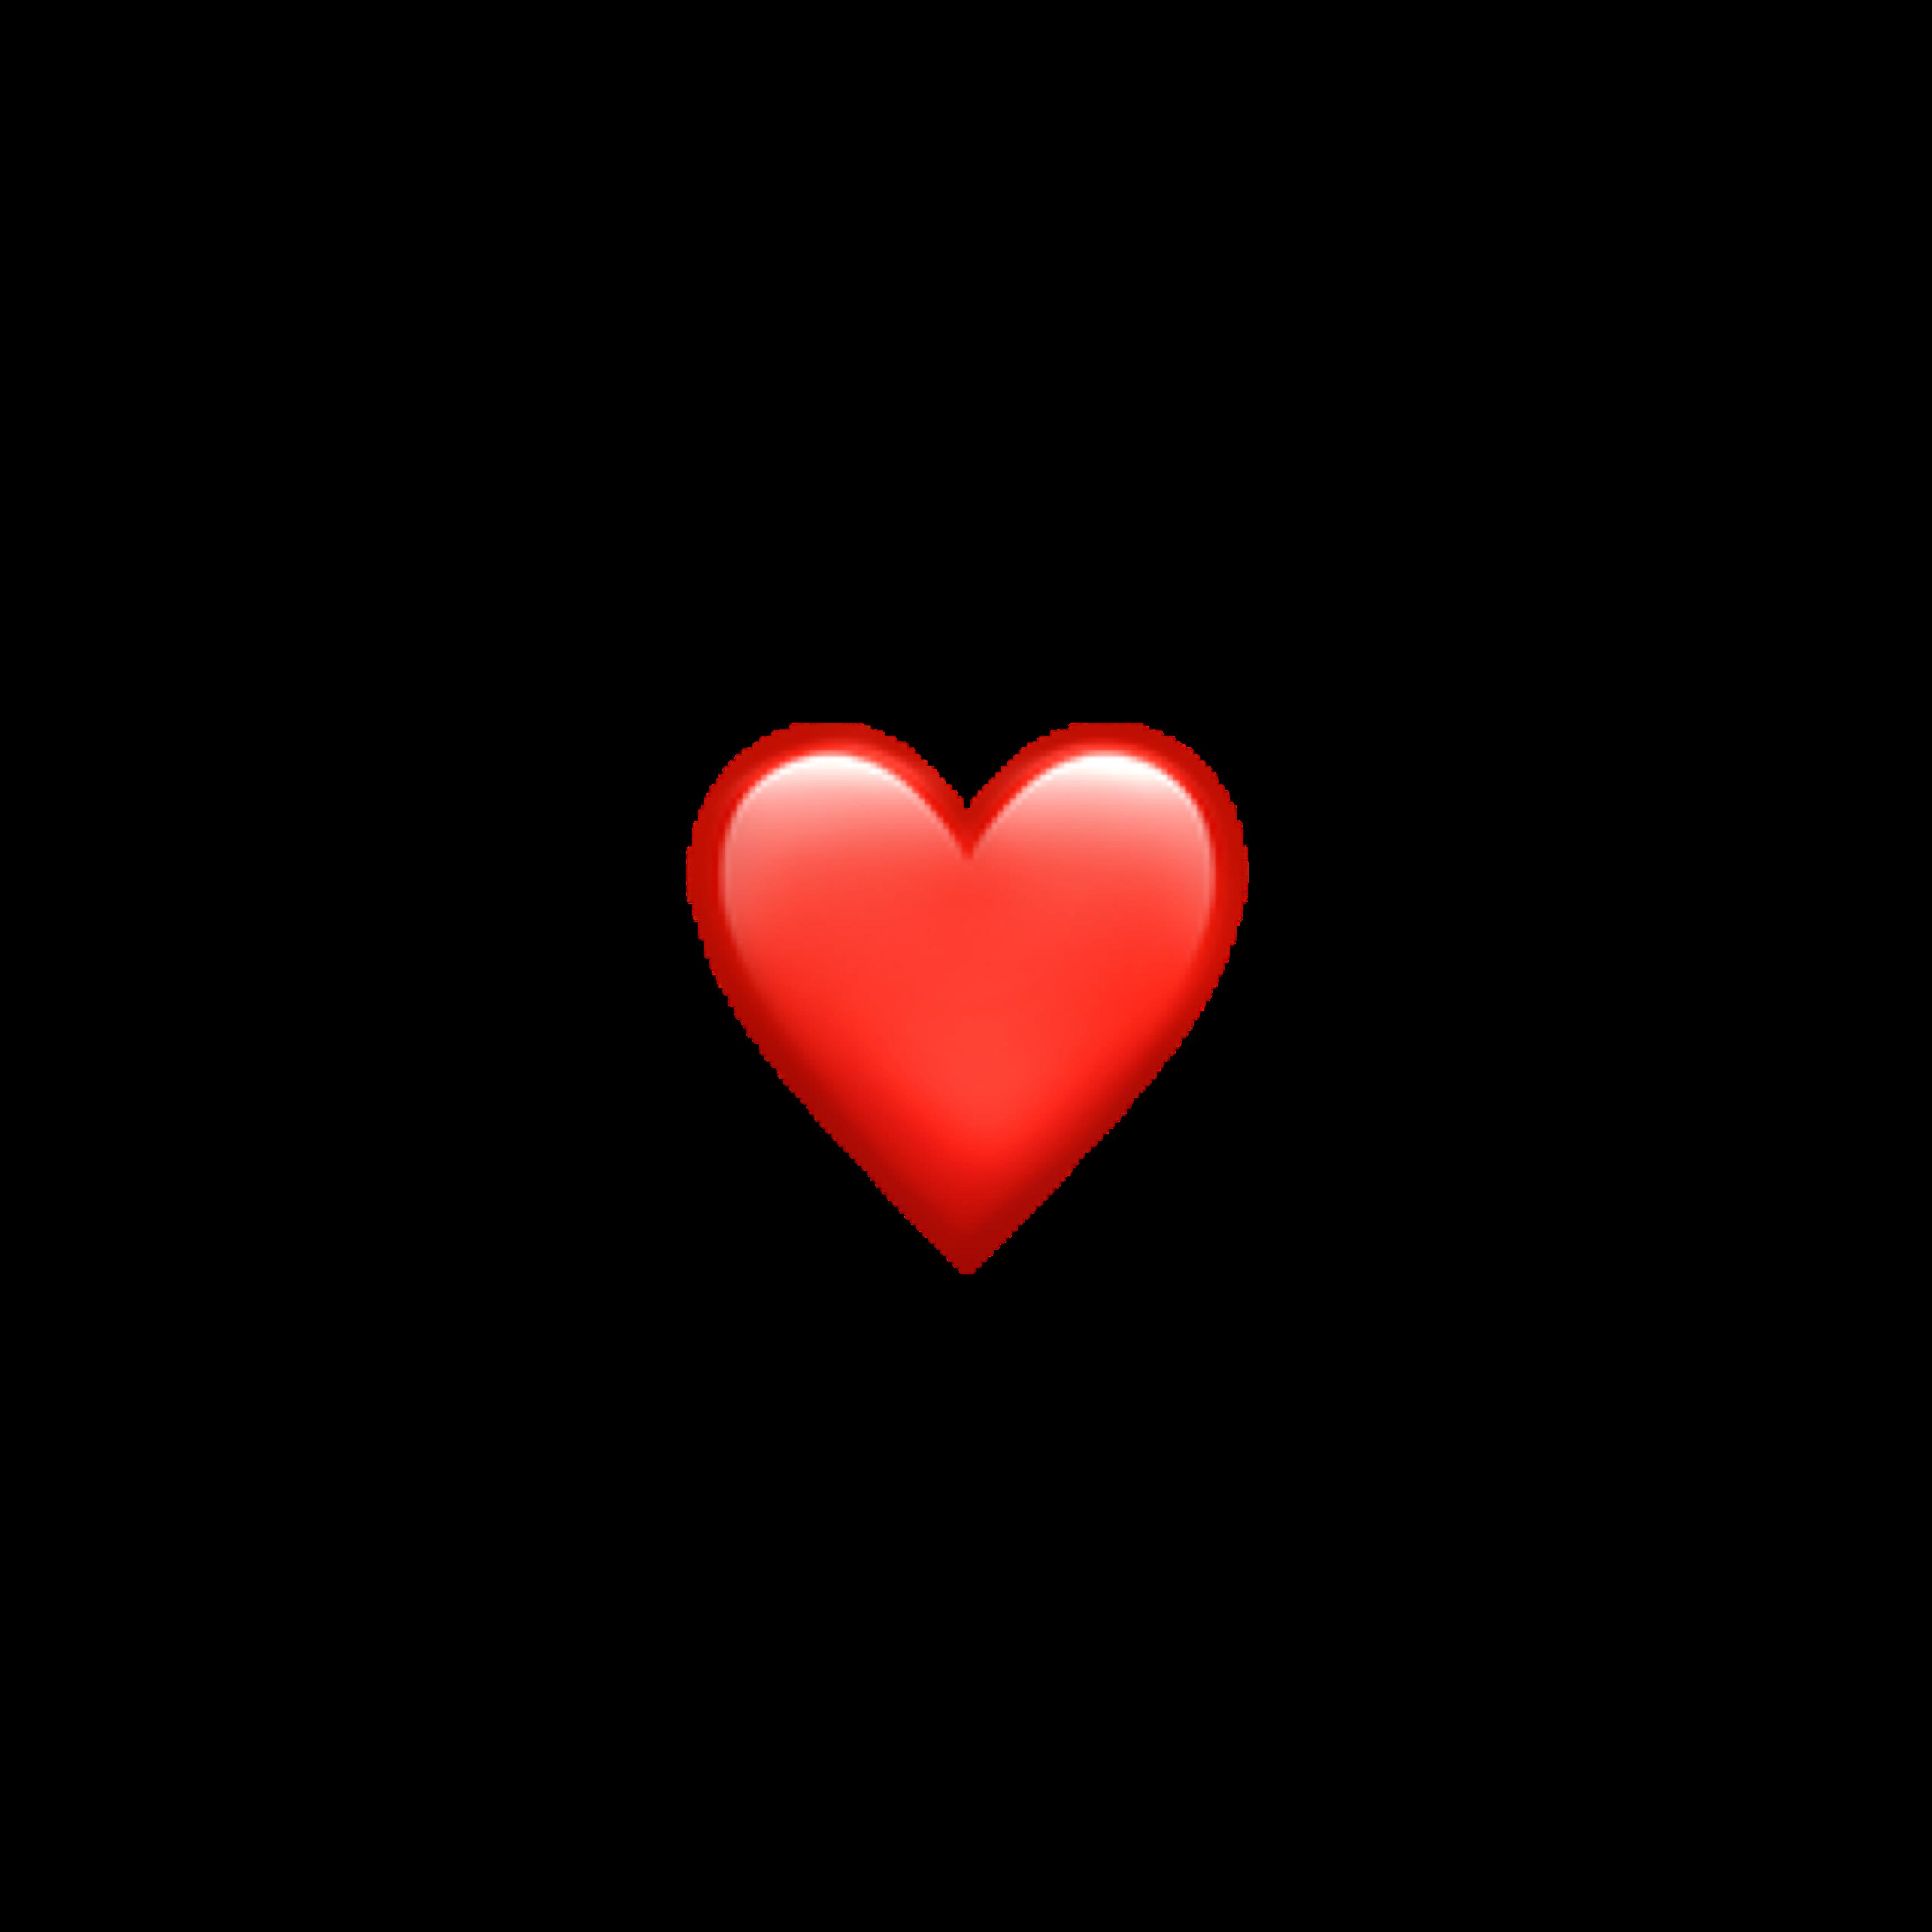 Heart Red Emoji Iphone Freetoedit